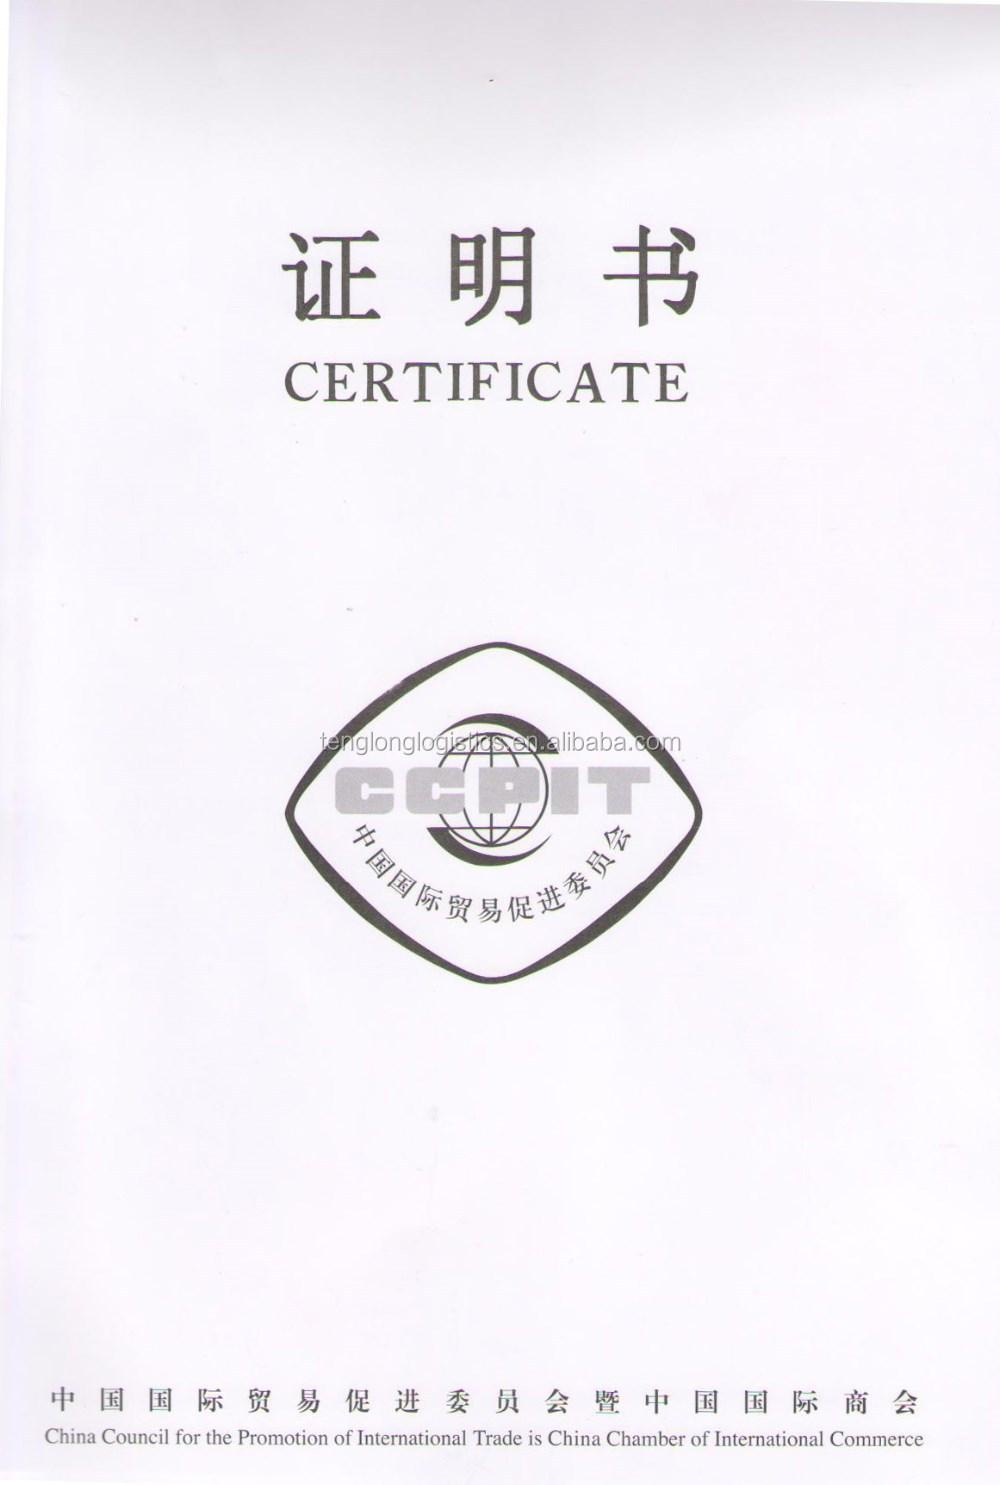 Saso Certificate Of Ccpit Ccpit Certificate Of Conformity Certification Of Saudi Arabia Buy Ccpit Certificate Of Conformity China Certificate Of